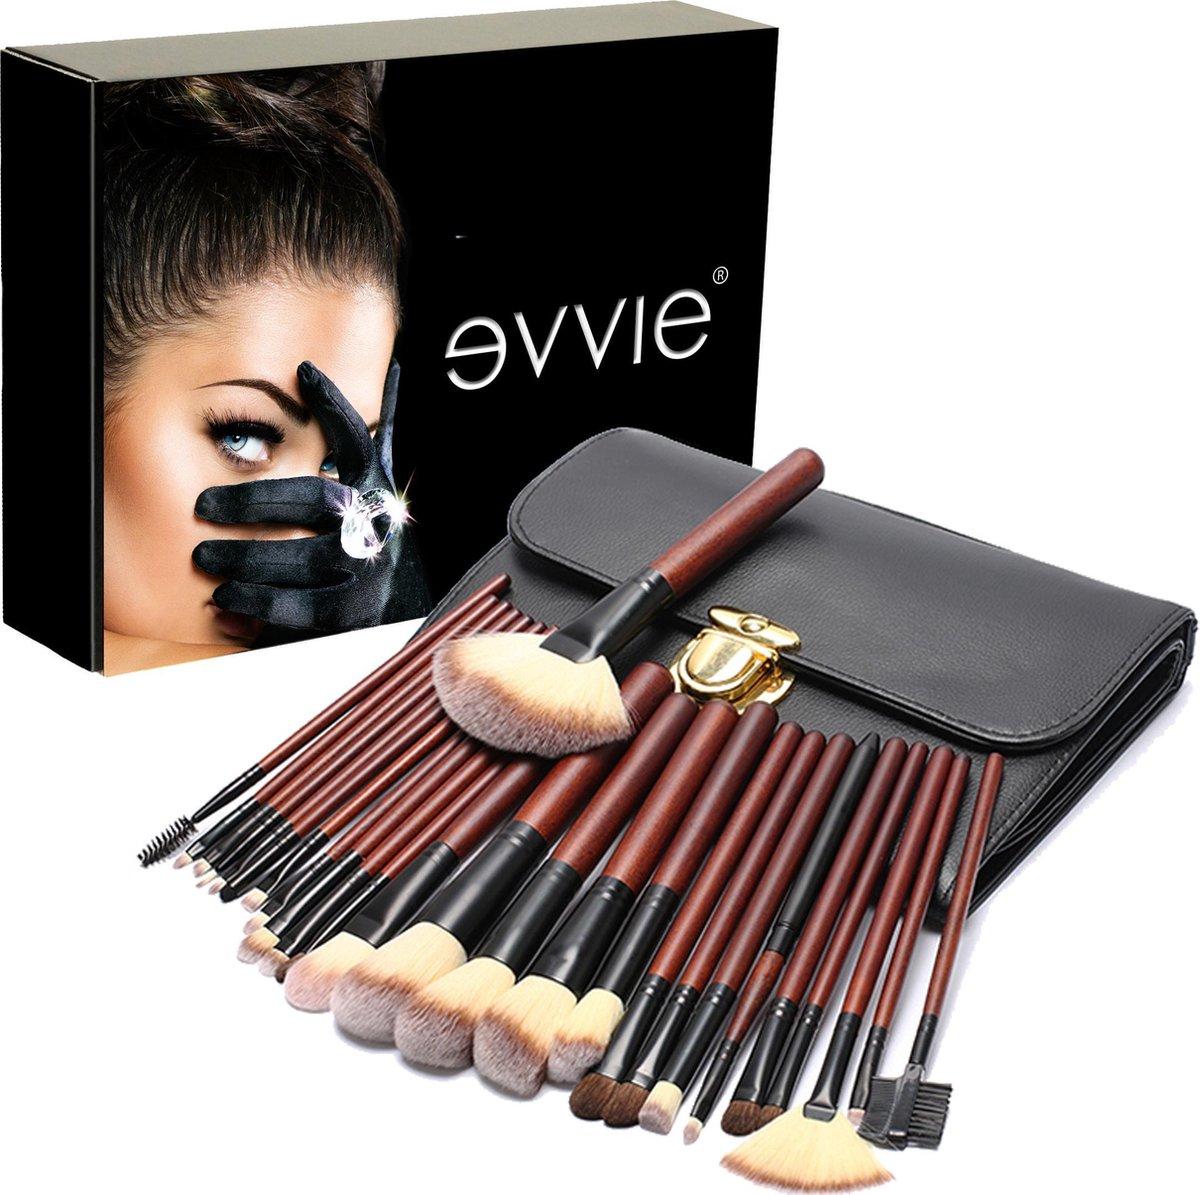 Evvie professionele 26-delige make-up kwasten set Deluxe - Evvie